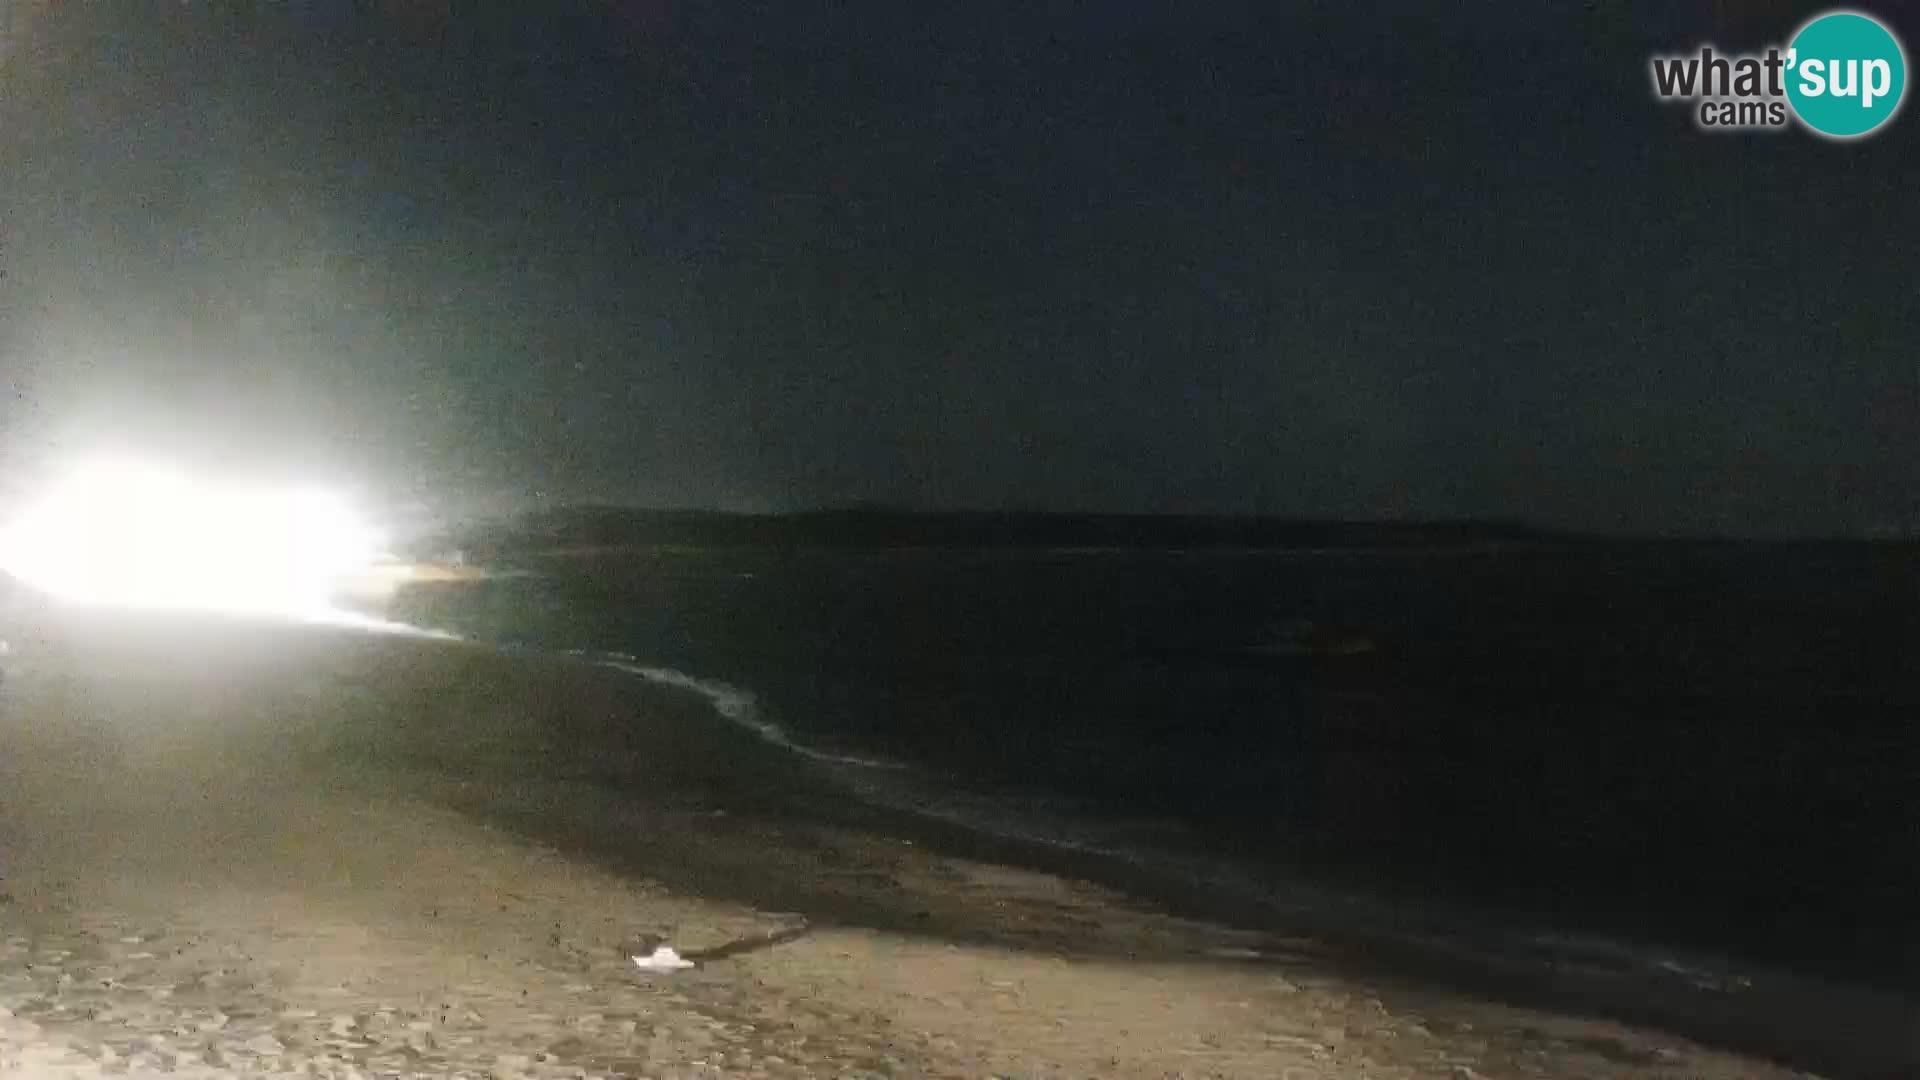 Plaža Vignola Mare spletna kamera Aglientu – Sardinija v živo